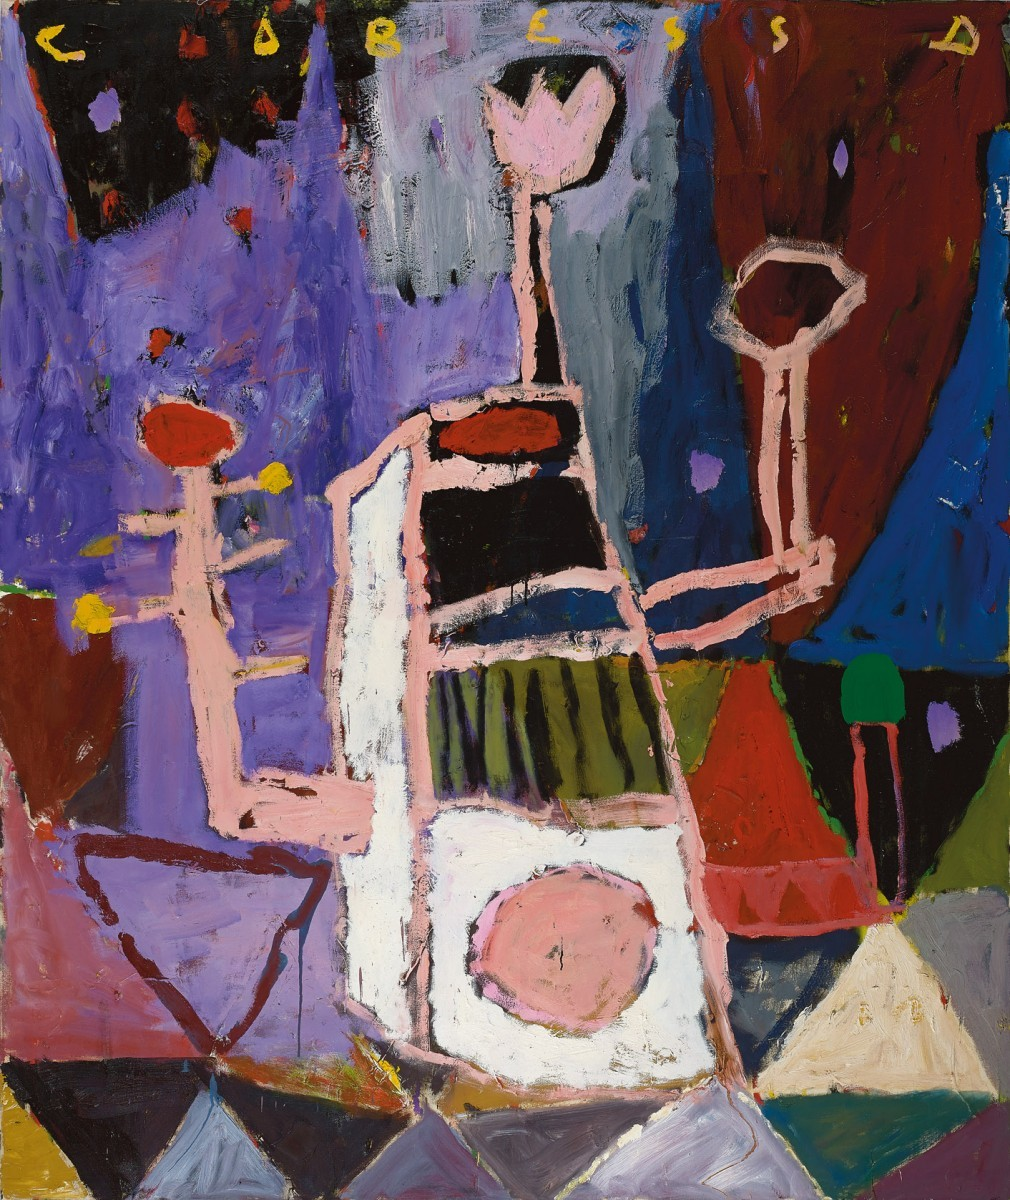 Amit Cabessa, 2017, Oil on canvas 190 x 160 cm